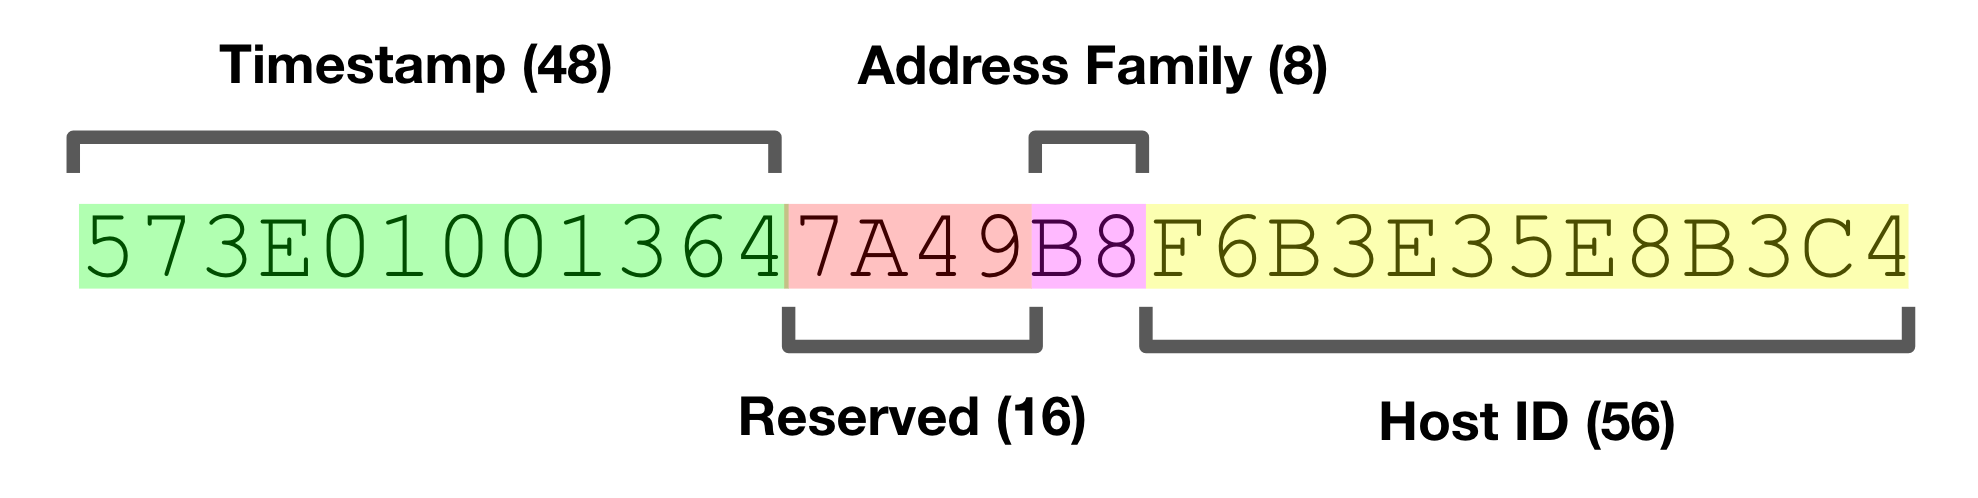 asset_A4WDXnNV.png-88.2kB